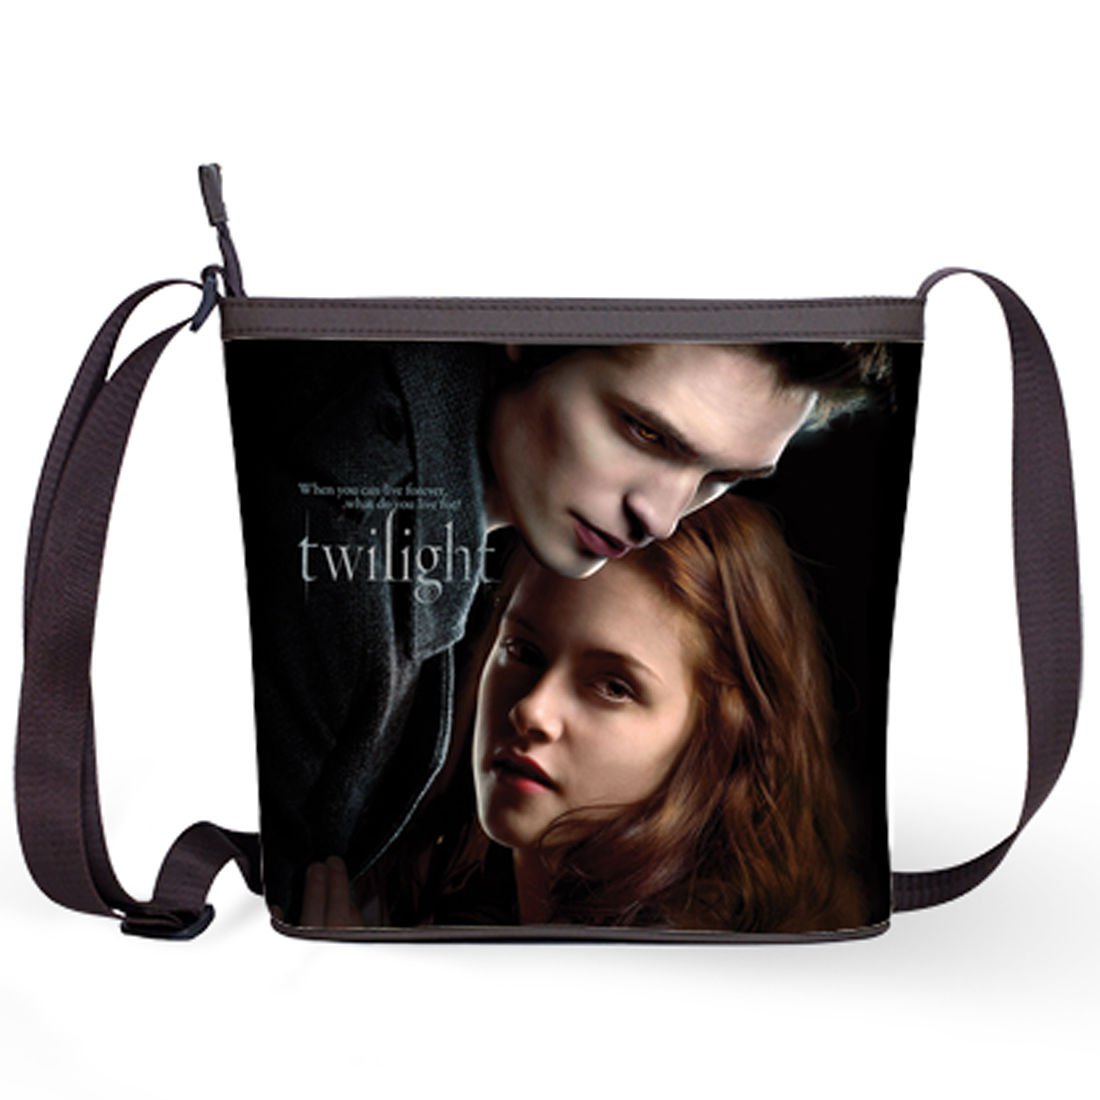 The Twilight Saga Shoulder Handbags Sling Bags Ladies Women's Teen Unique Shaped Handbags